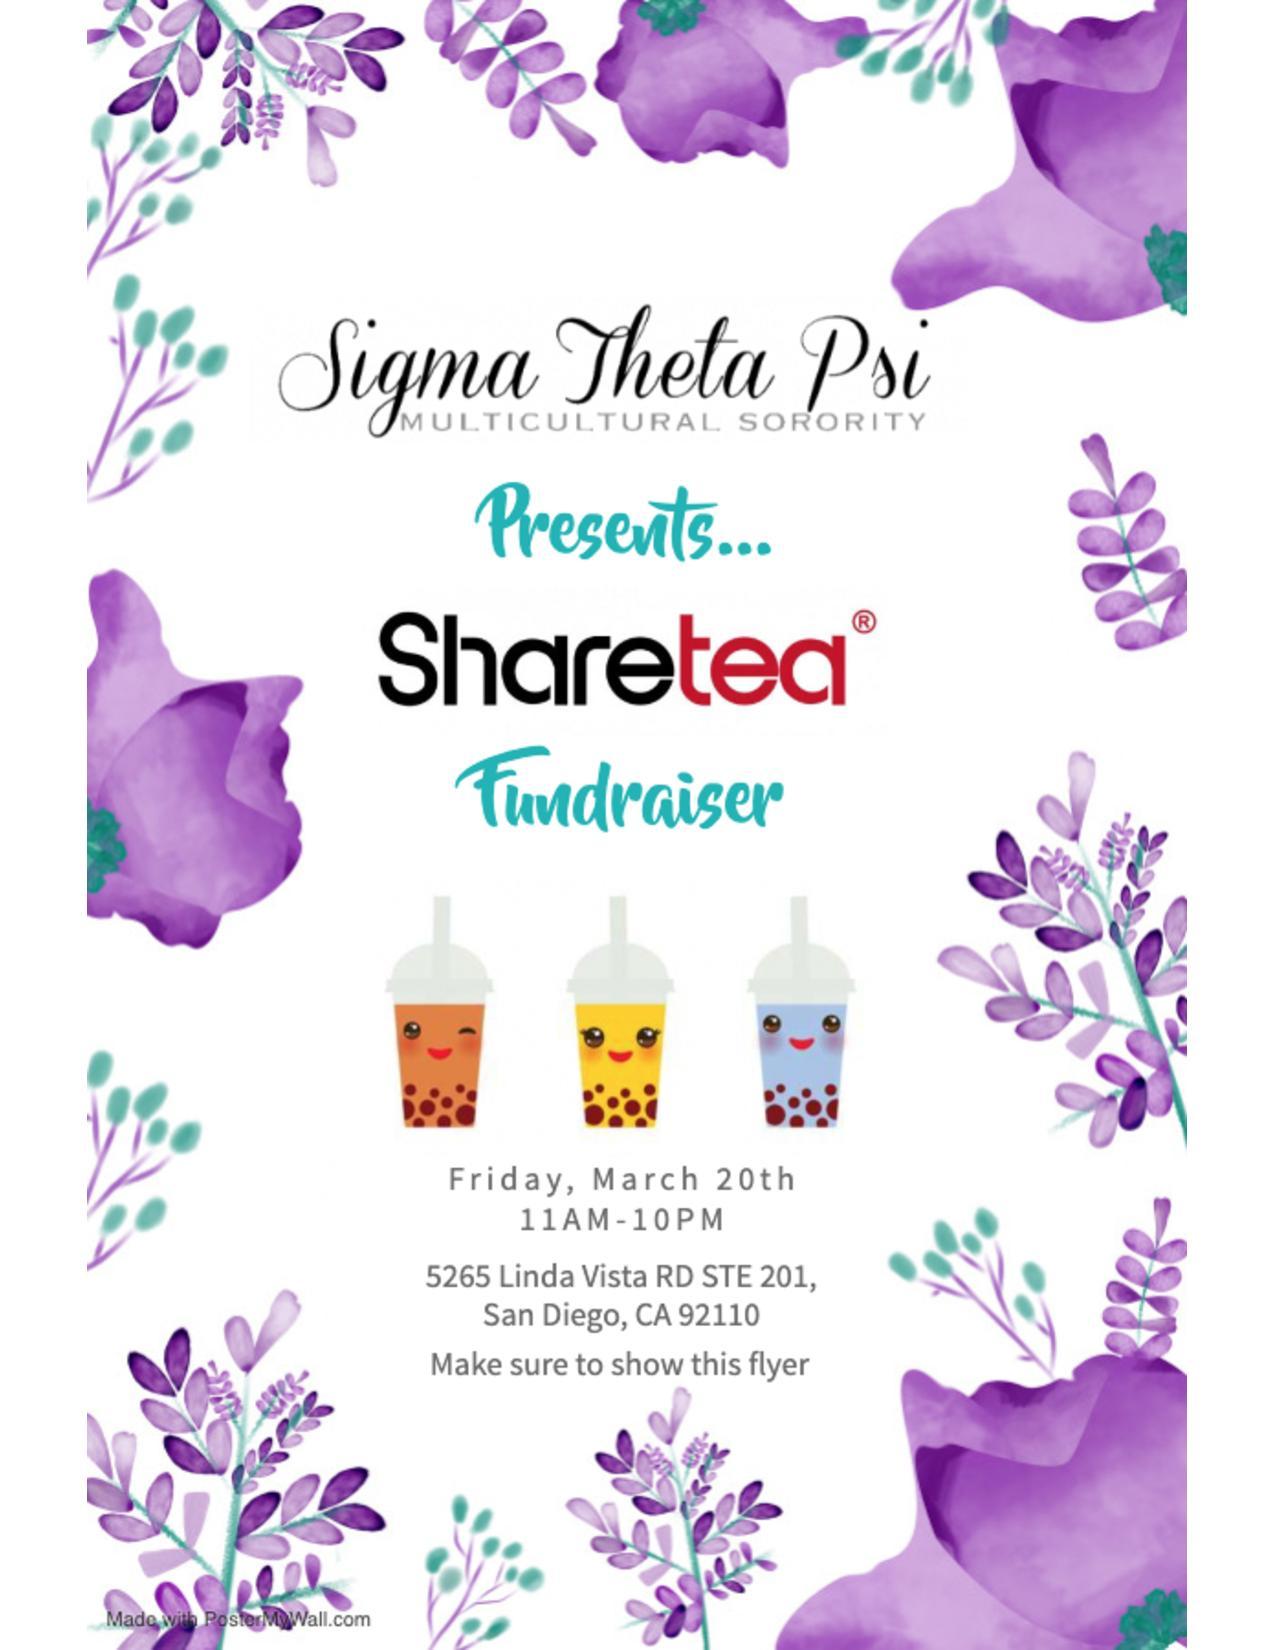 Sharetea Fundraiser